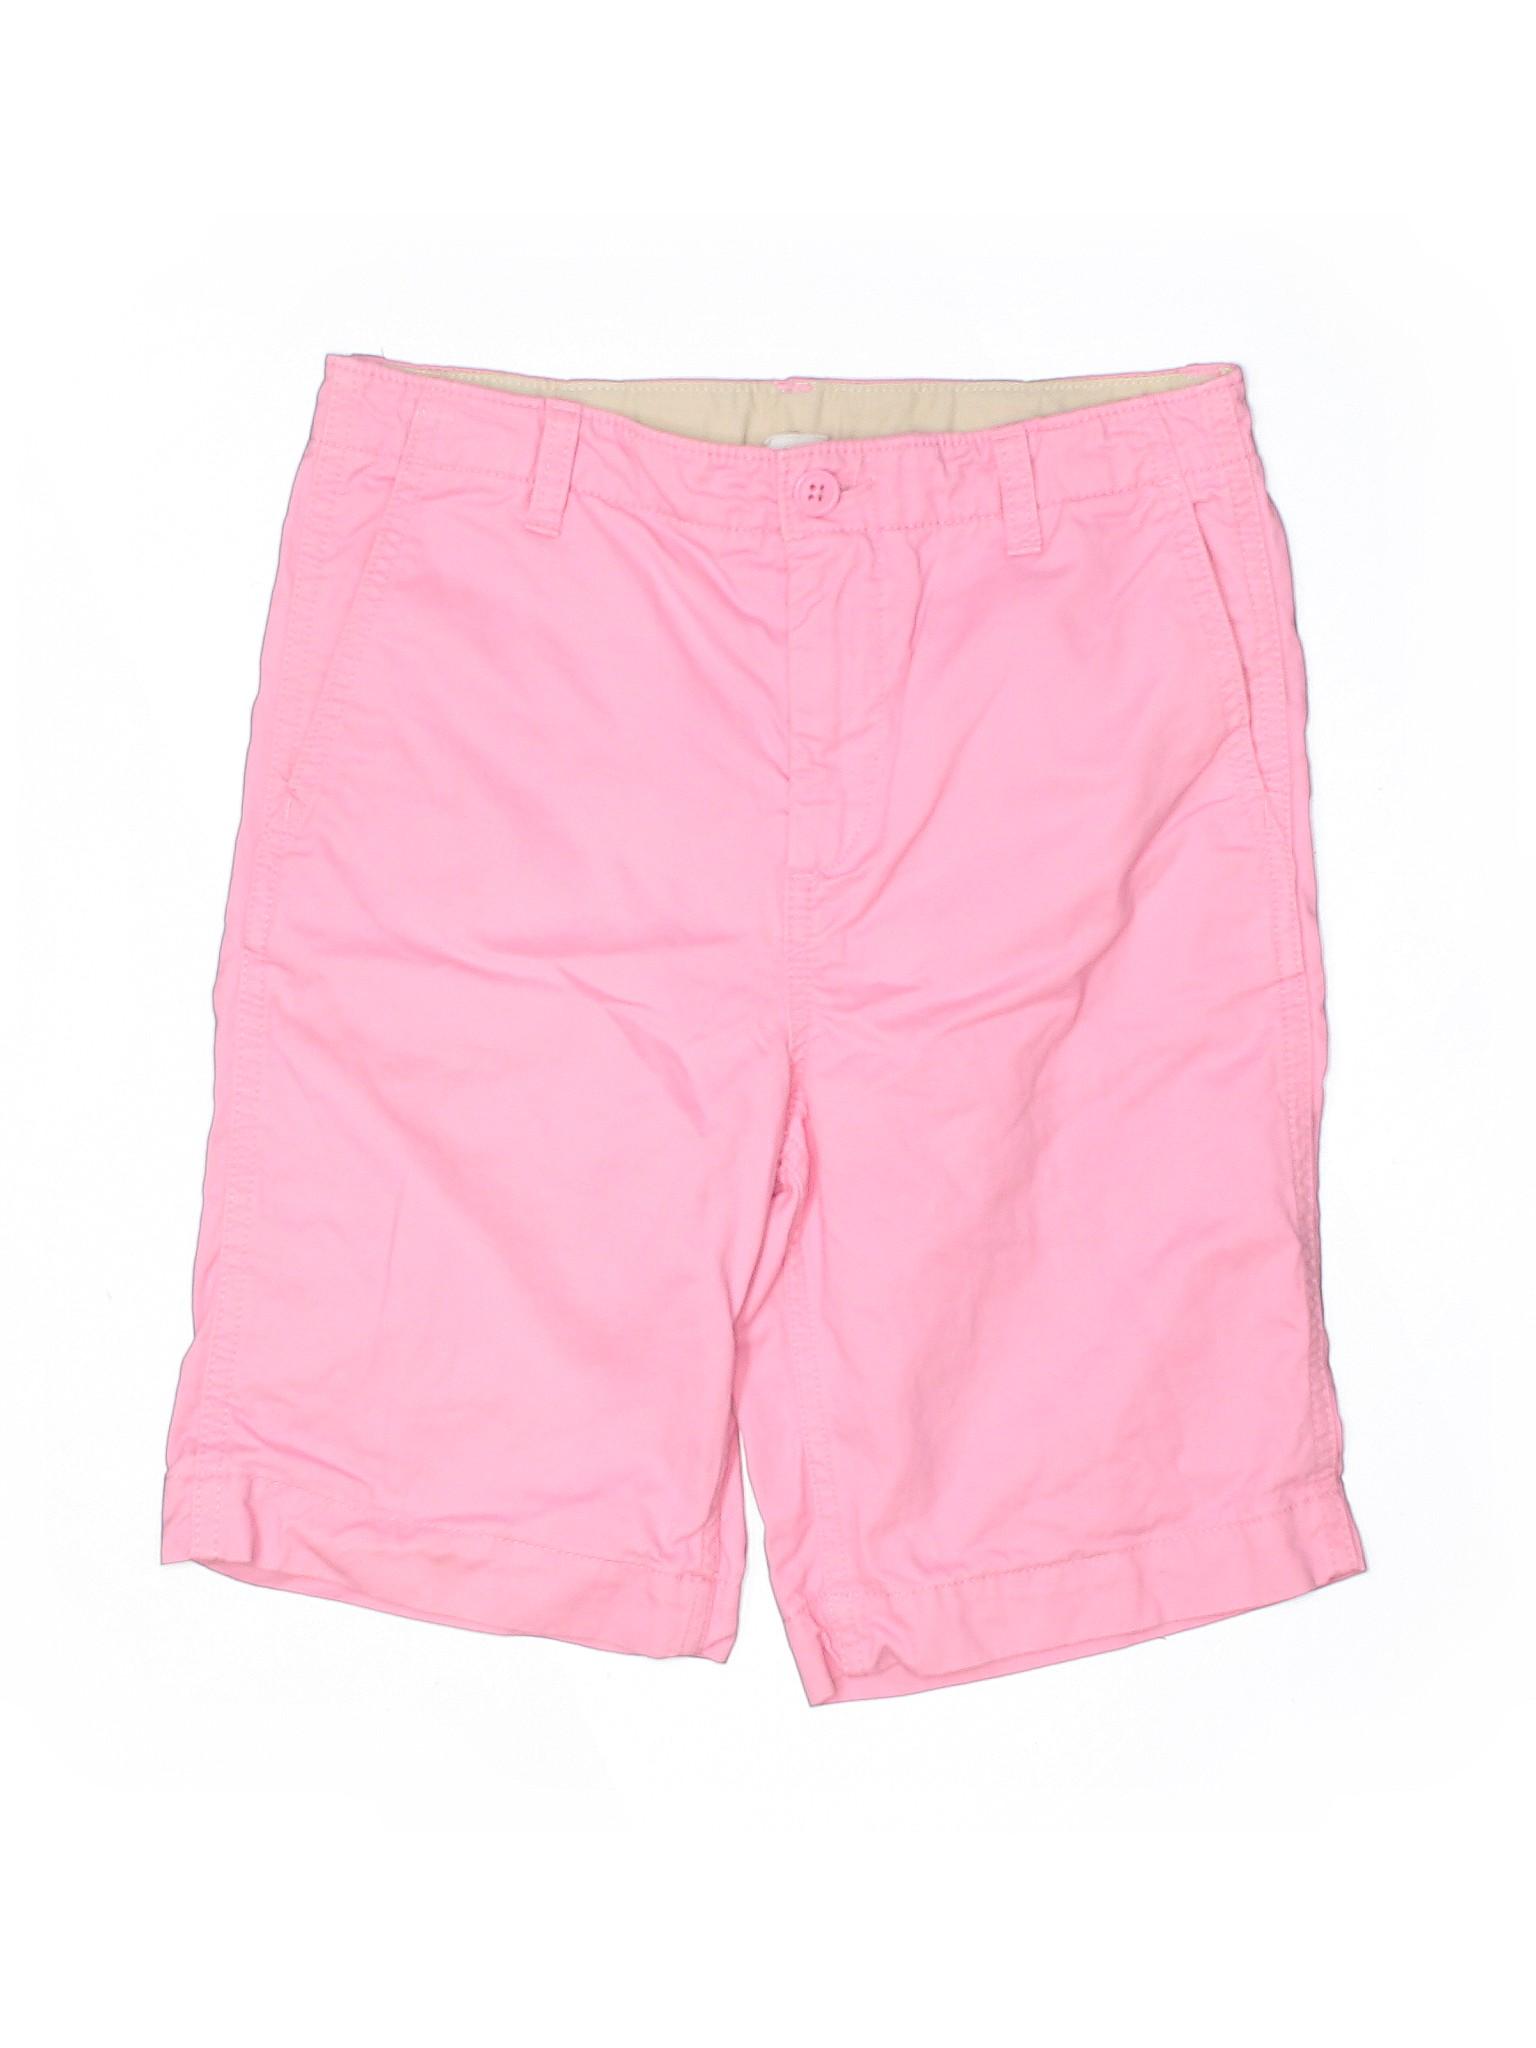 Arizona Boys Chino Shorts Cotton Regular Husky Kids size 8 10 12 14 16 20 NEW